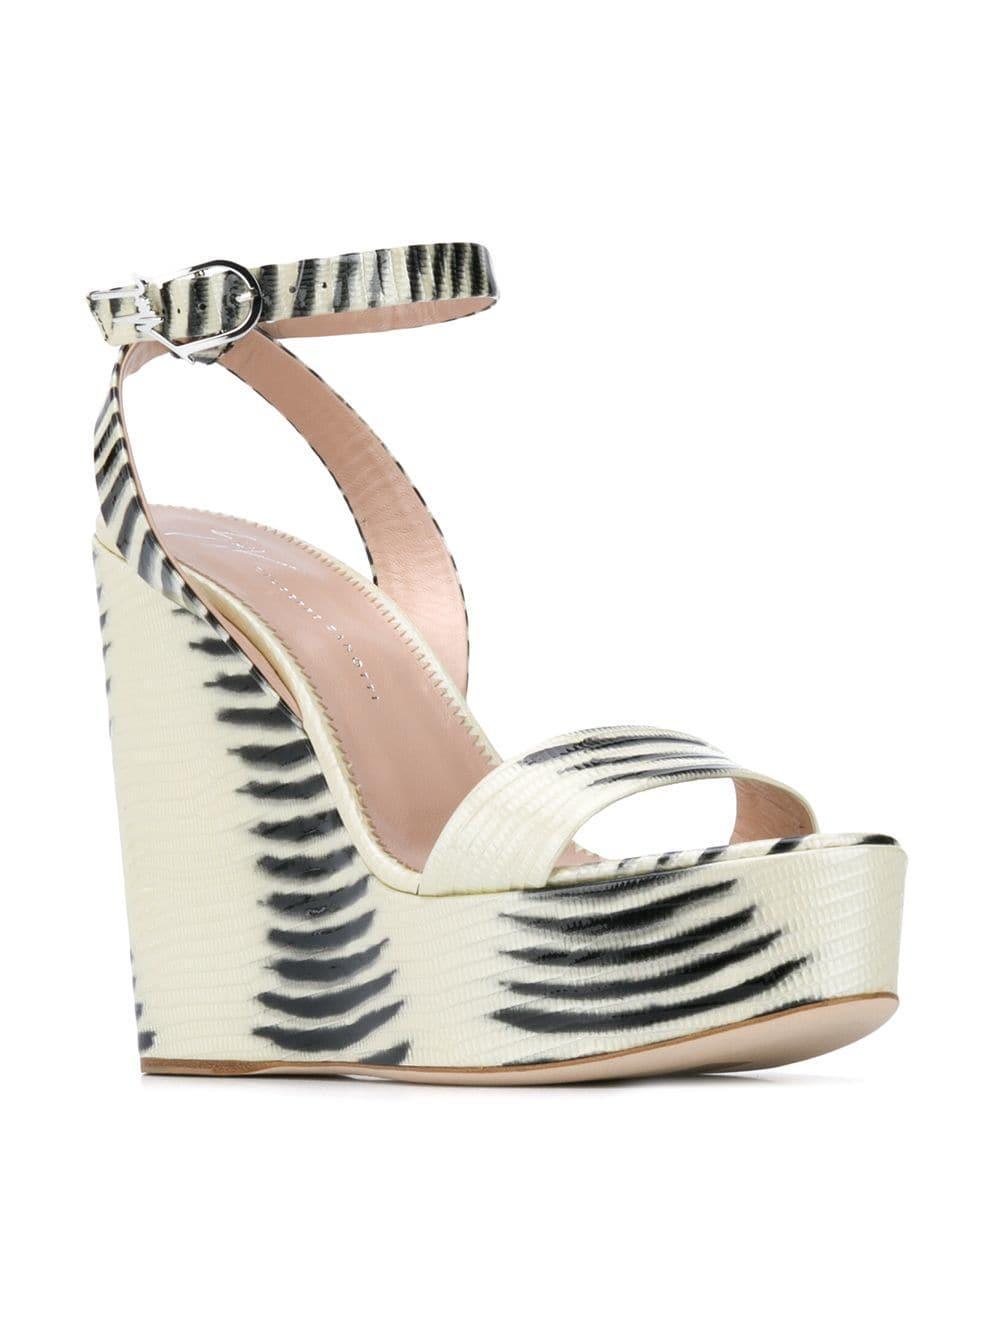 2808c23849a Giuseppe Zanotti - White Betty Wedge Sandals - Lyst. View fullscreen